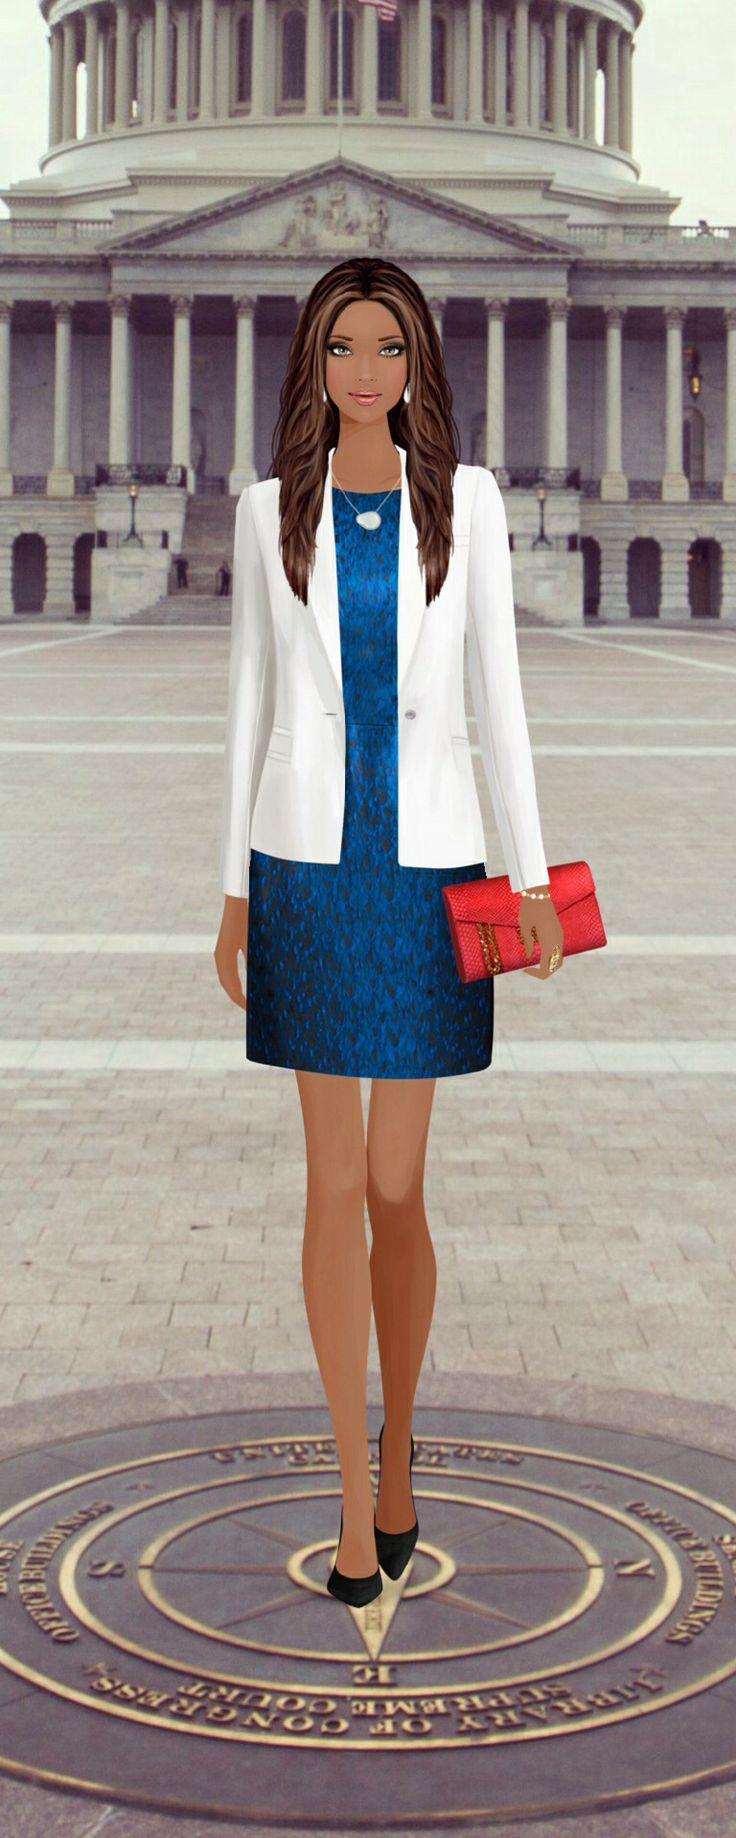 Fashion Games For Women